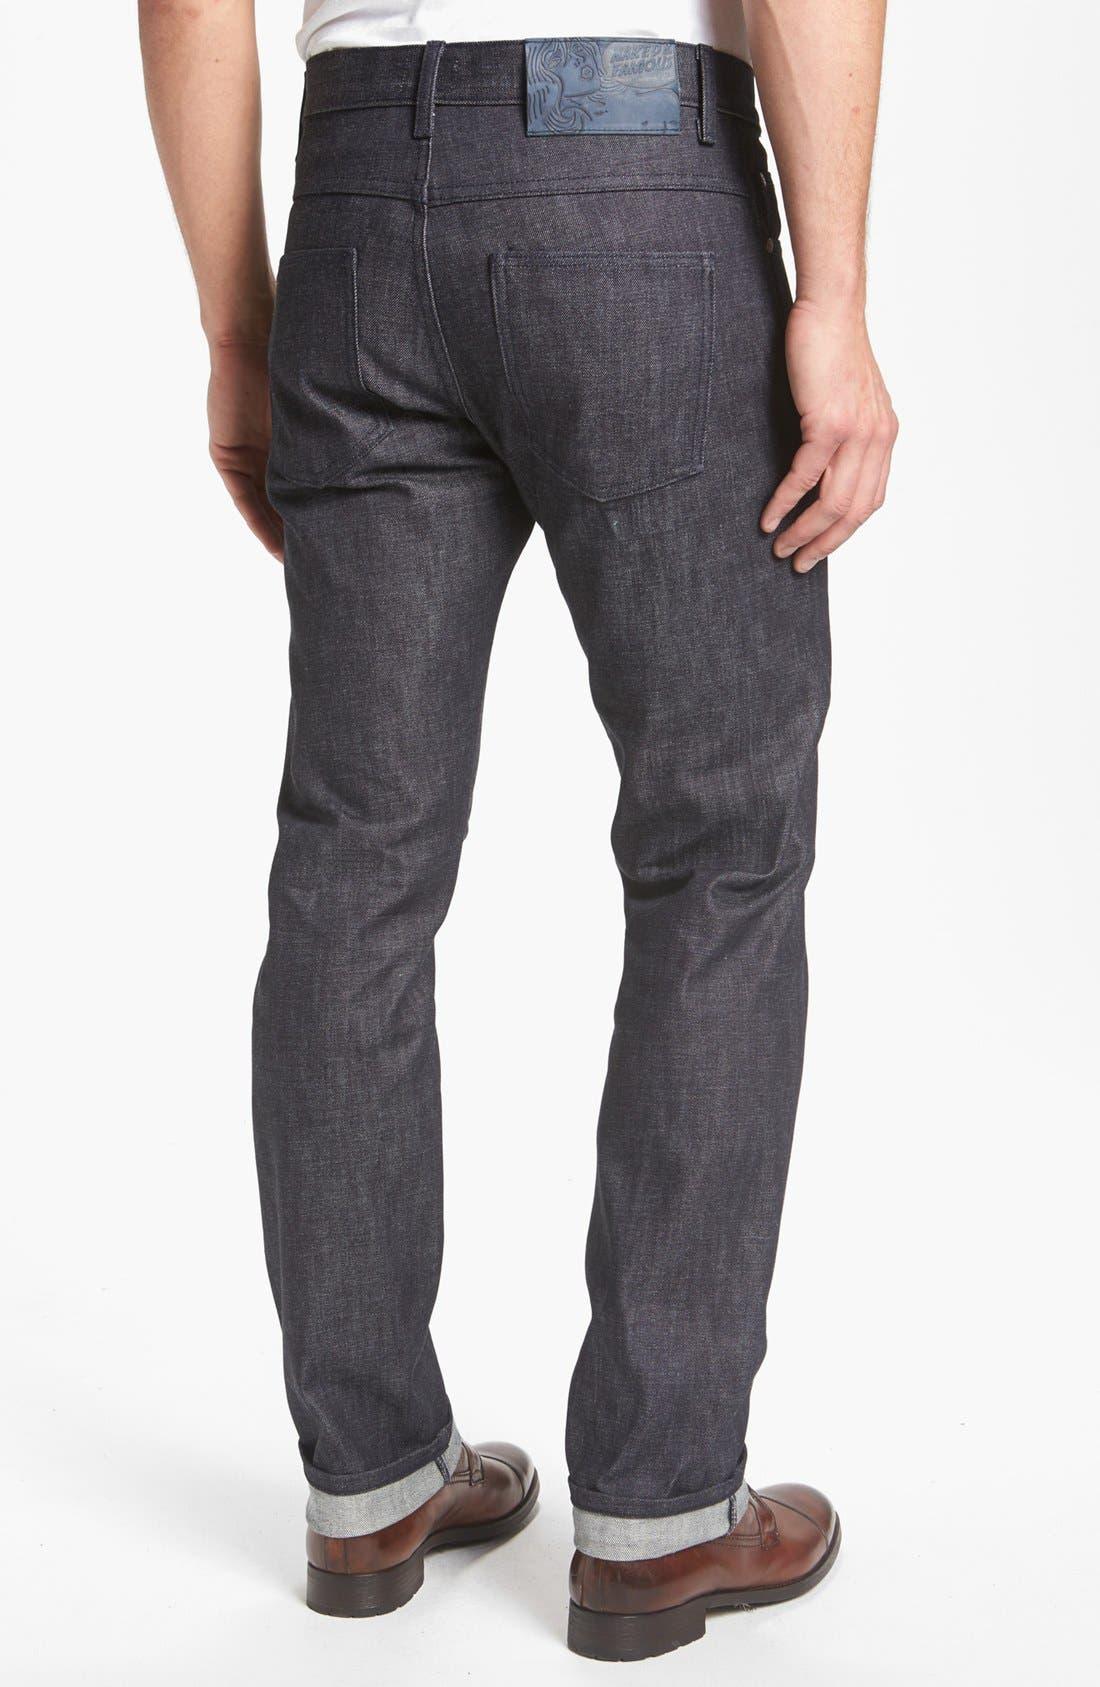 Main Image - Naked & Famous Denim 'Slim Guy' Straight Leg Raw Jeans (Natural Denim) (Online Only)